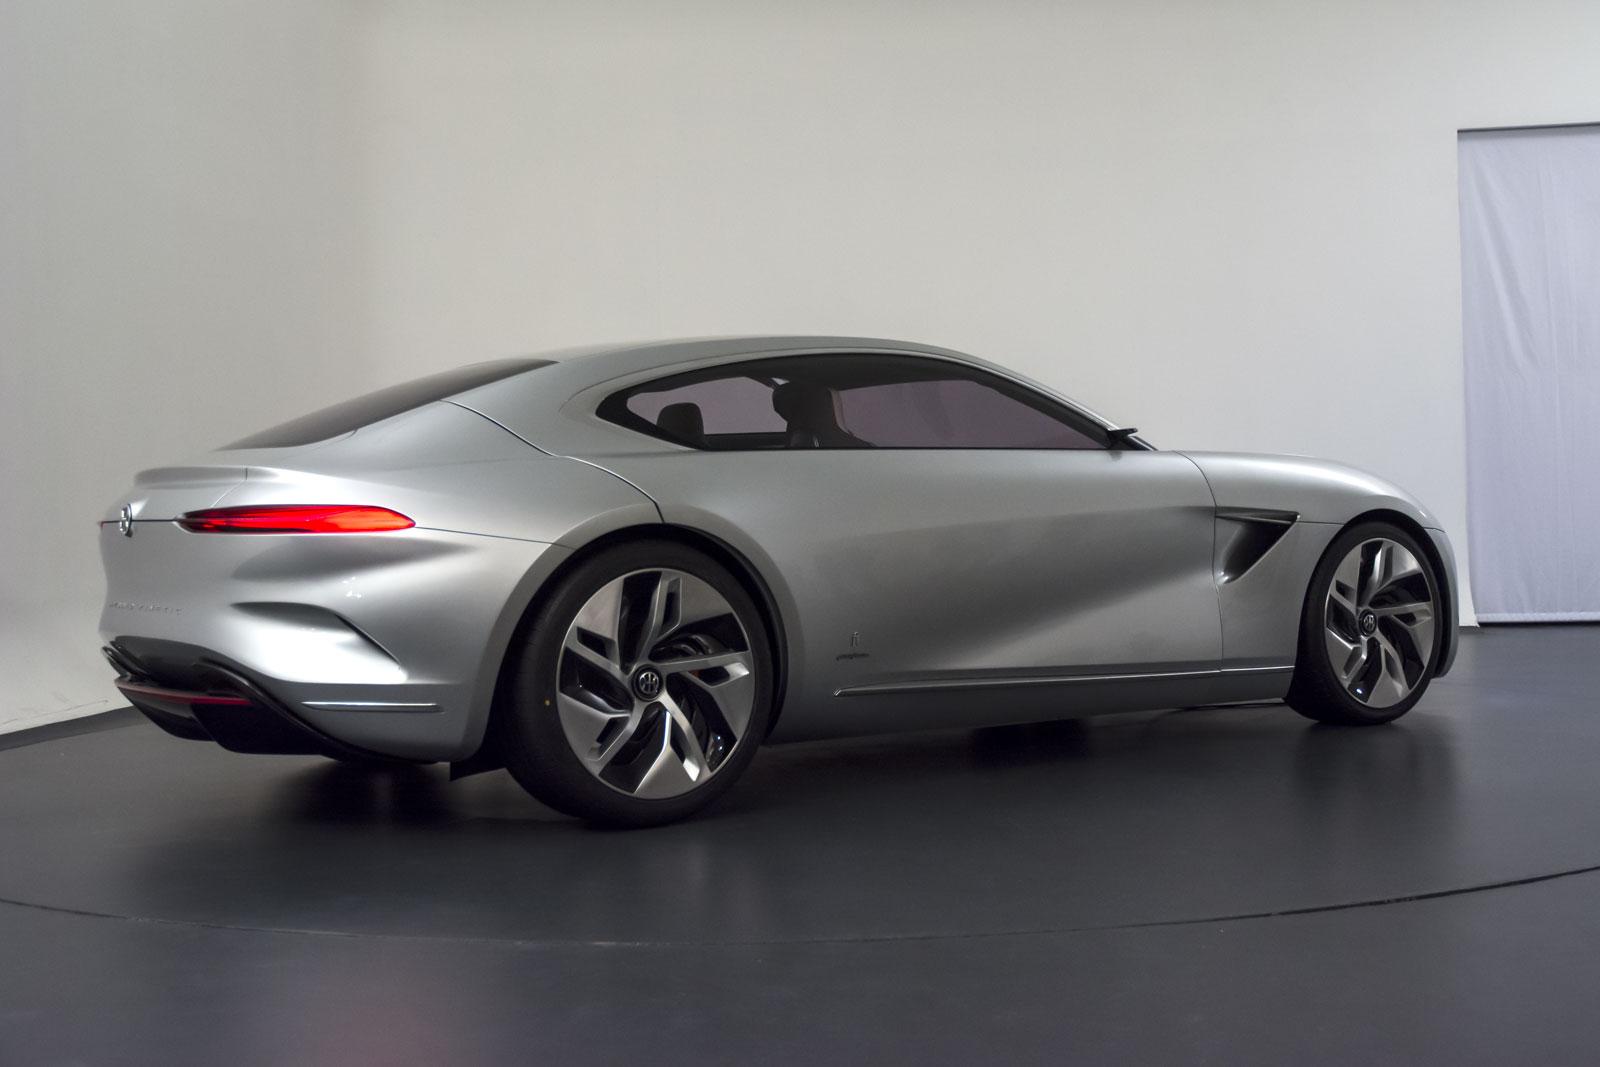 2018 - [Pininfarina] PF0 Concept / Battista  01-Pininfarina-HK-GT-02